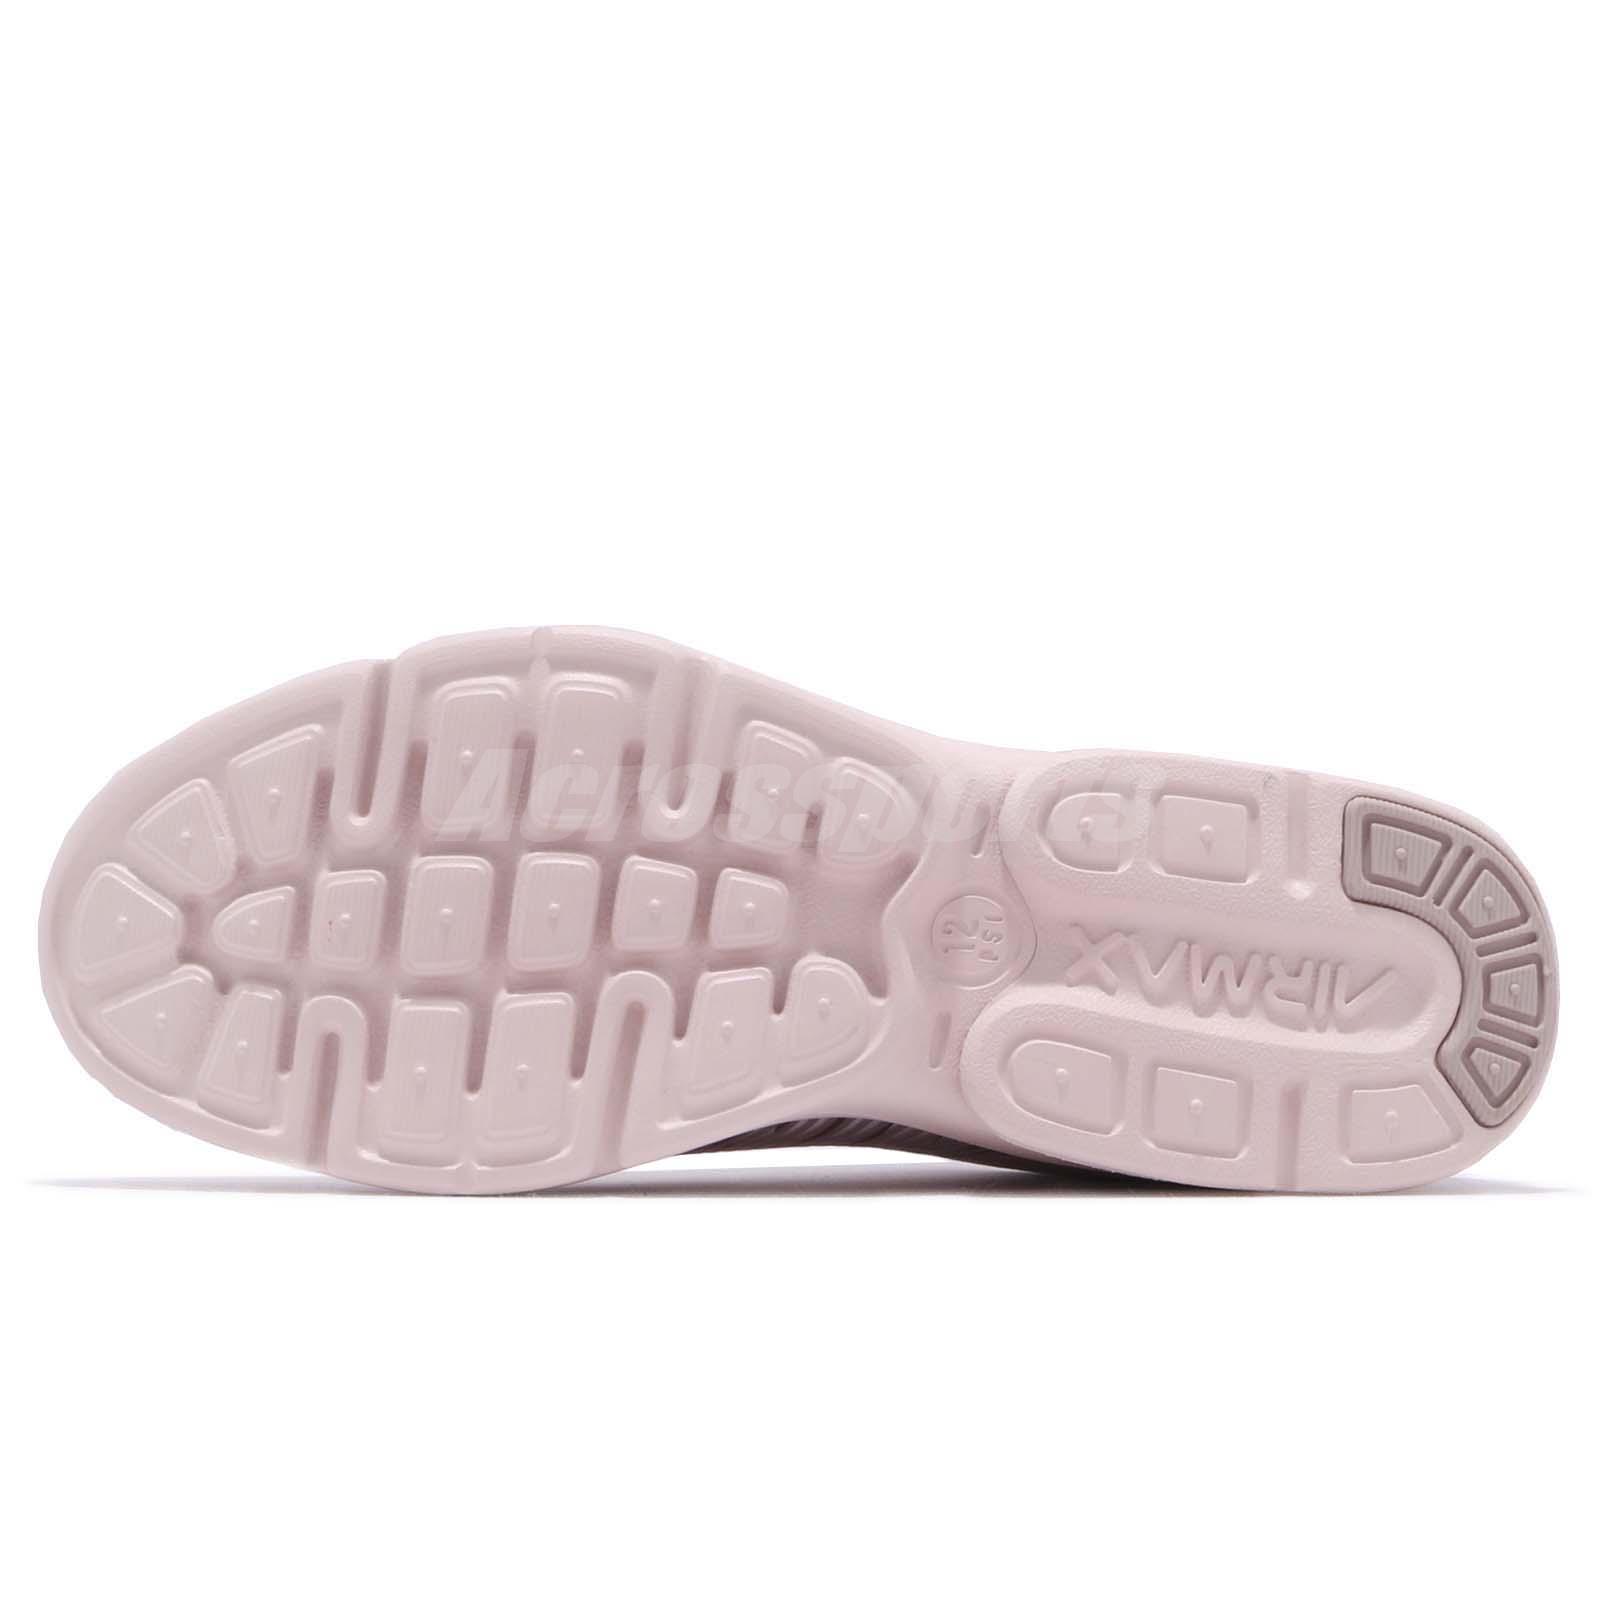 e0e3e43c1065 Nike Wmns Air Max Advantage 2 II Particle Rose Pink White Women ...